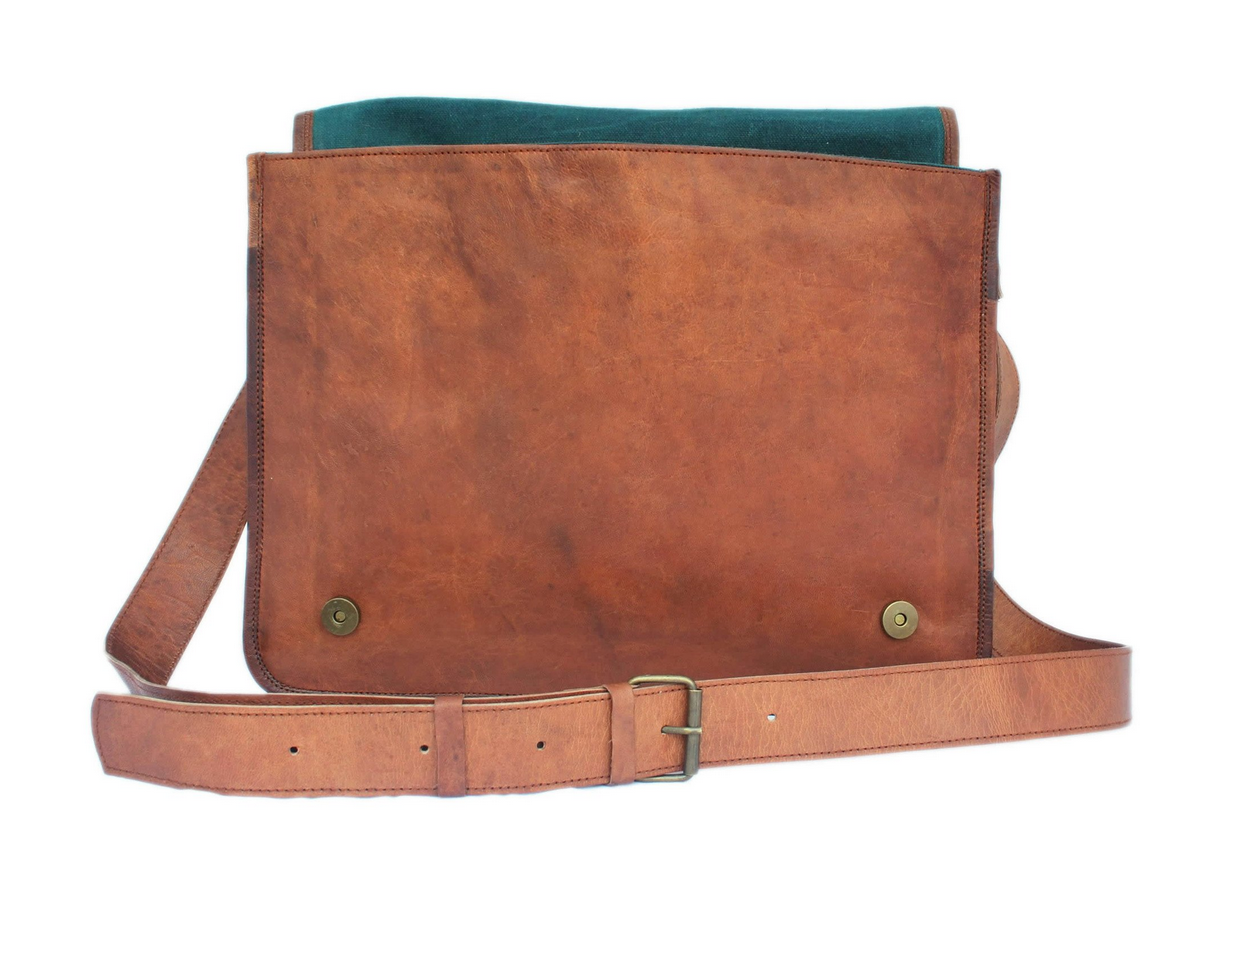 aa16184c7 Vintage brown leather messenger bag 15